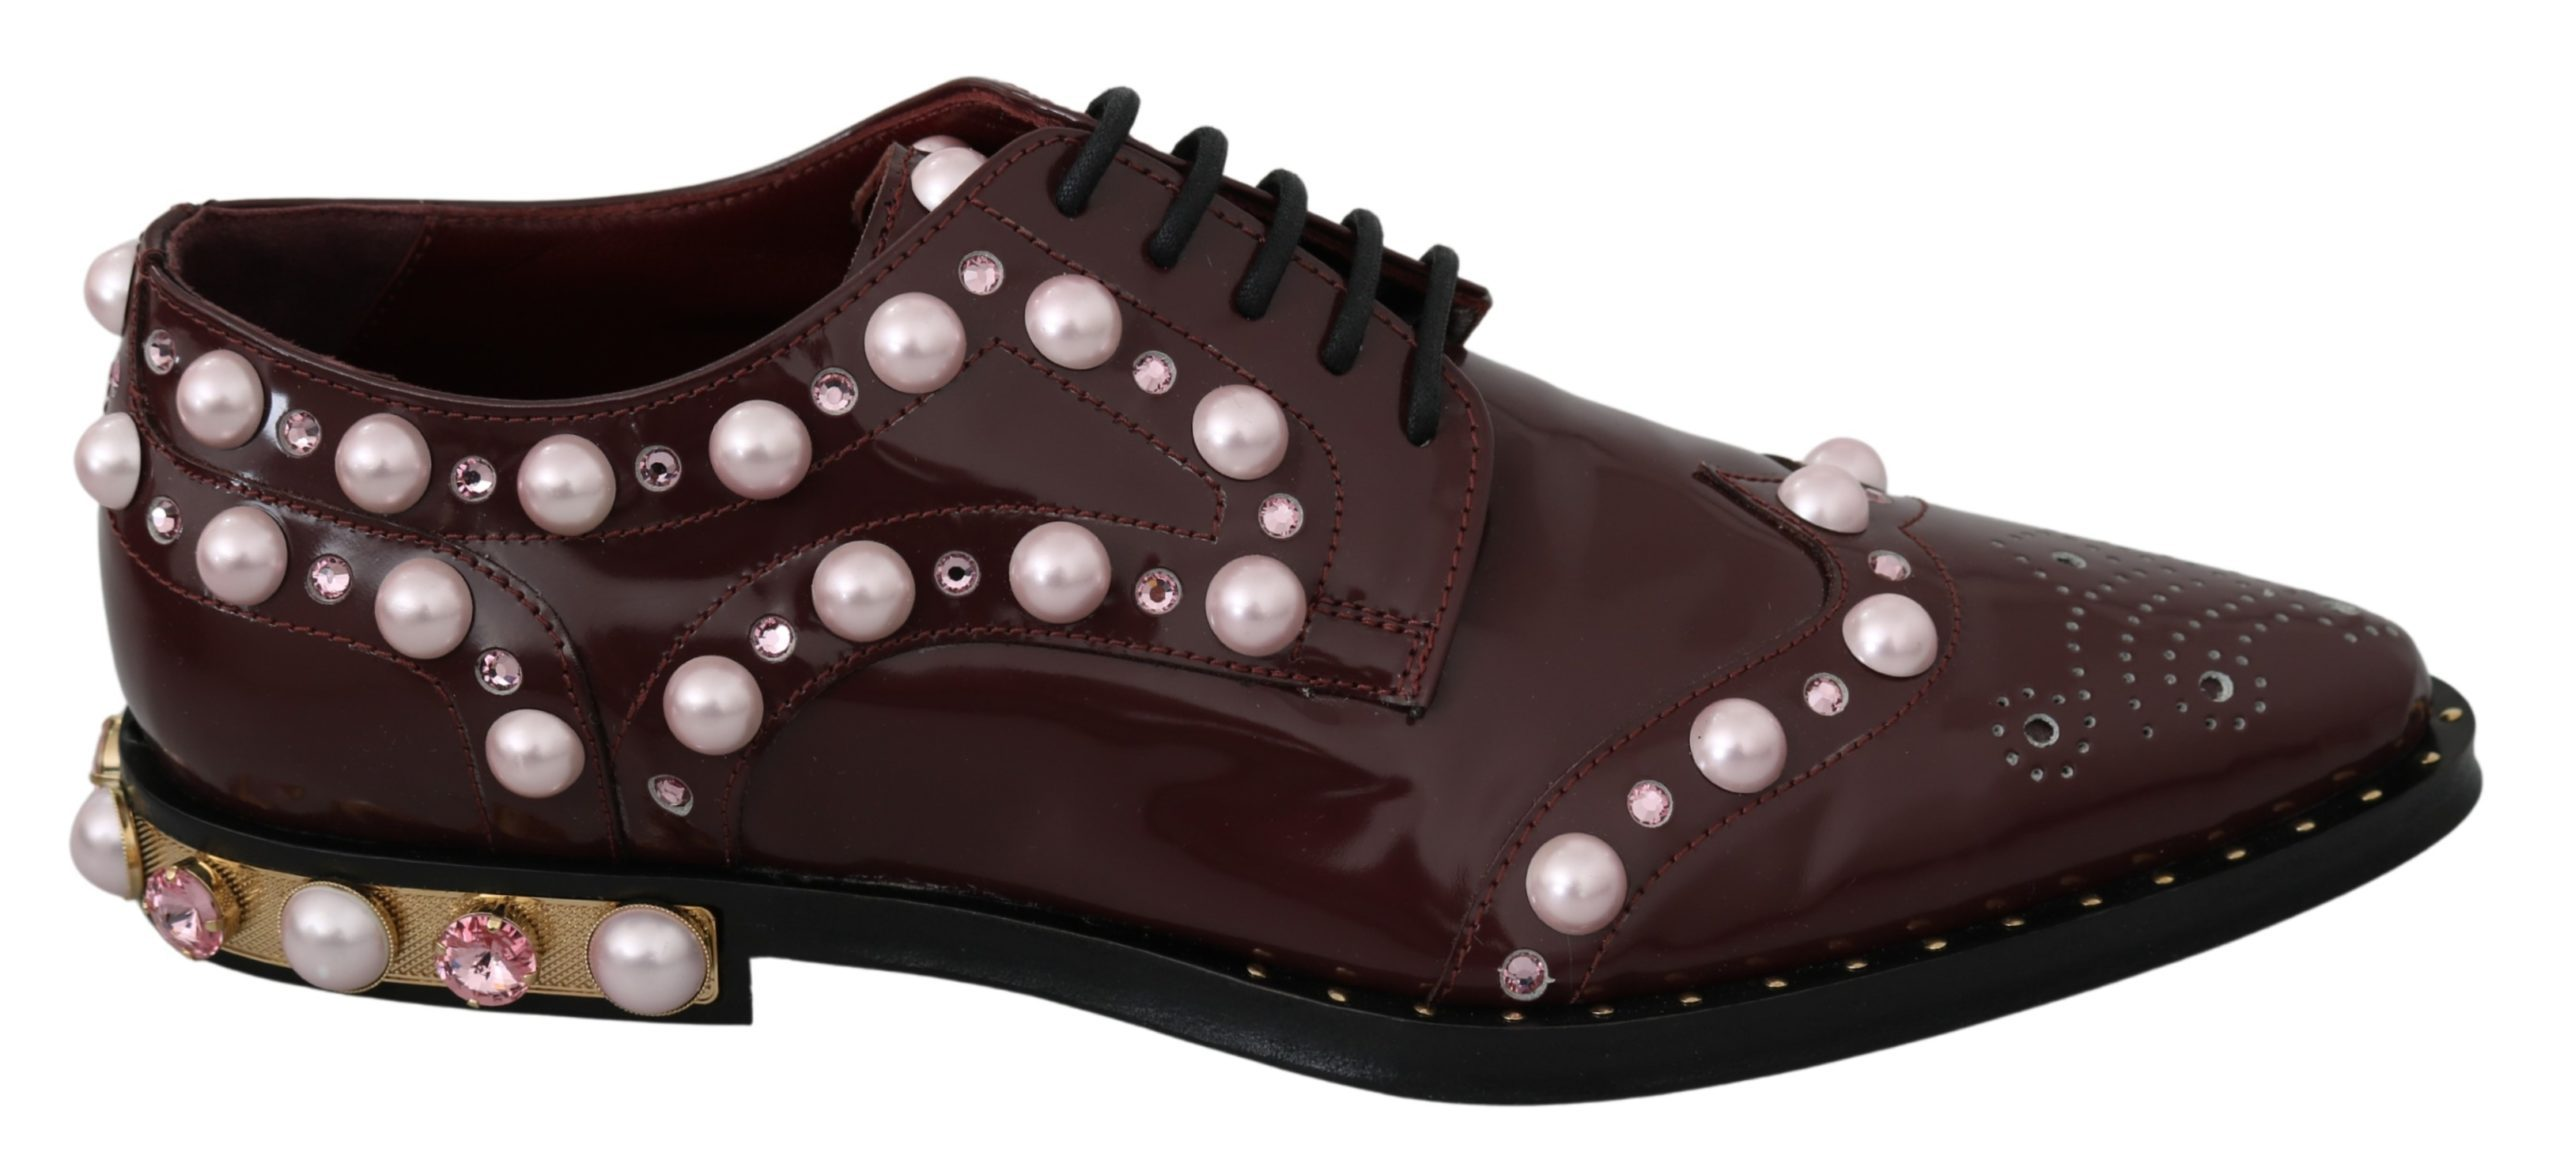 Dolce & Gabbana Women's Leather Crystal Pearls Formal Shoes Bordeaux LA6911 - EU39/US6